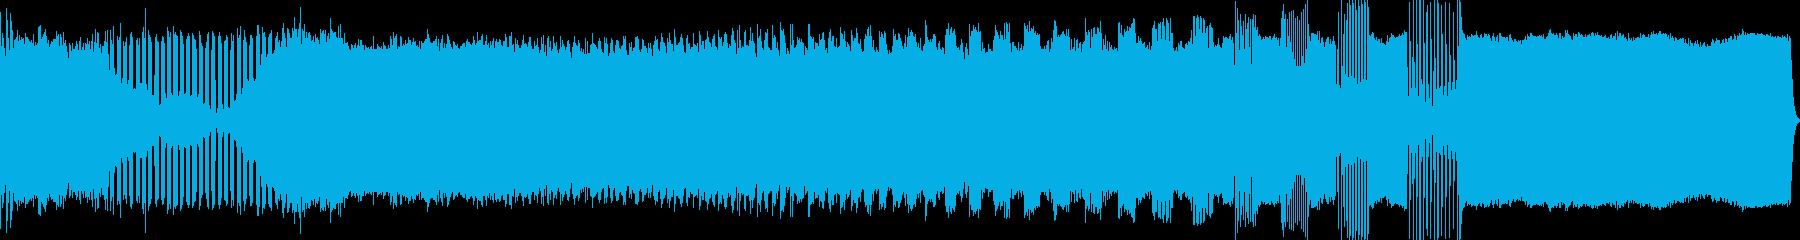 AMGアナログFX 5の再生済みの波形